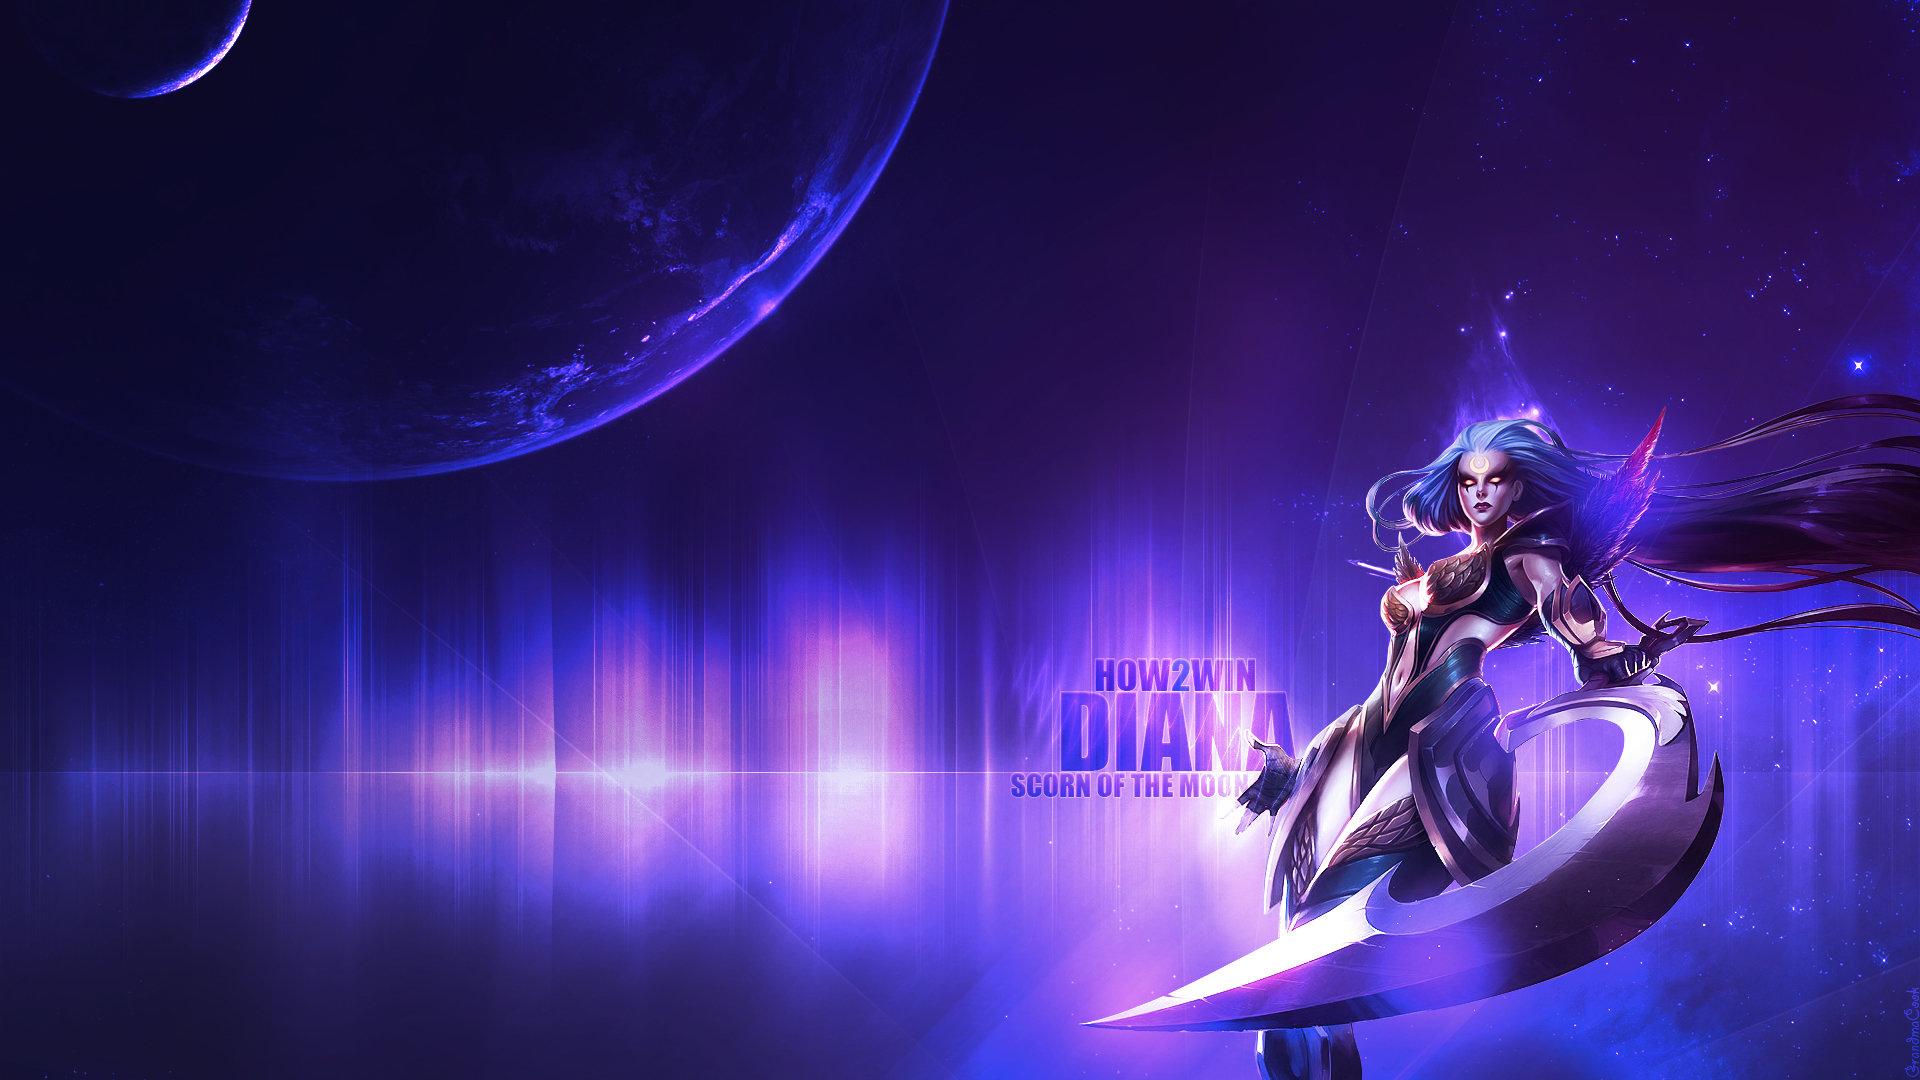 Diana League Of Legends Wallpapers Hd For Desktop Backgrounds